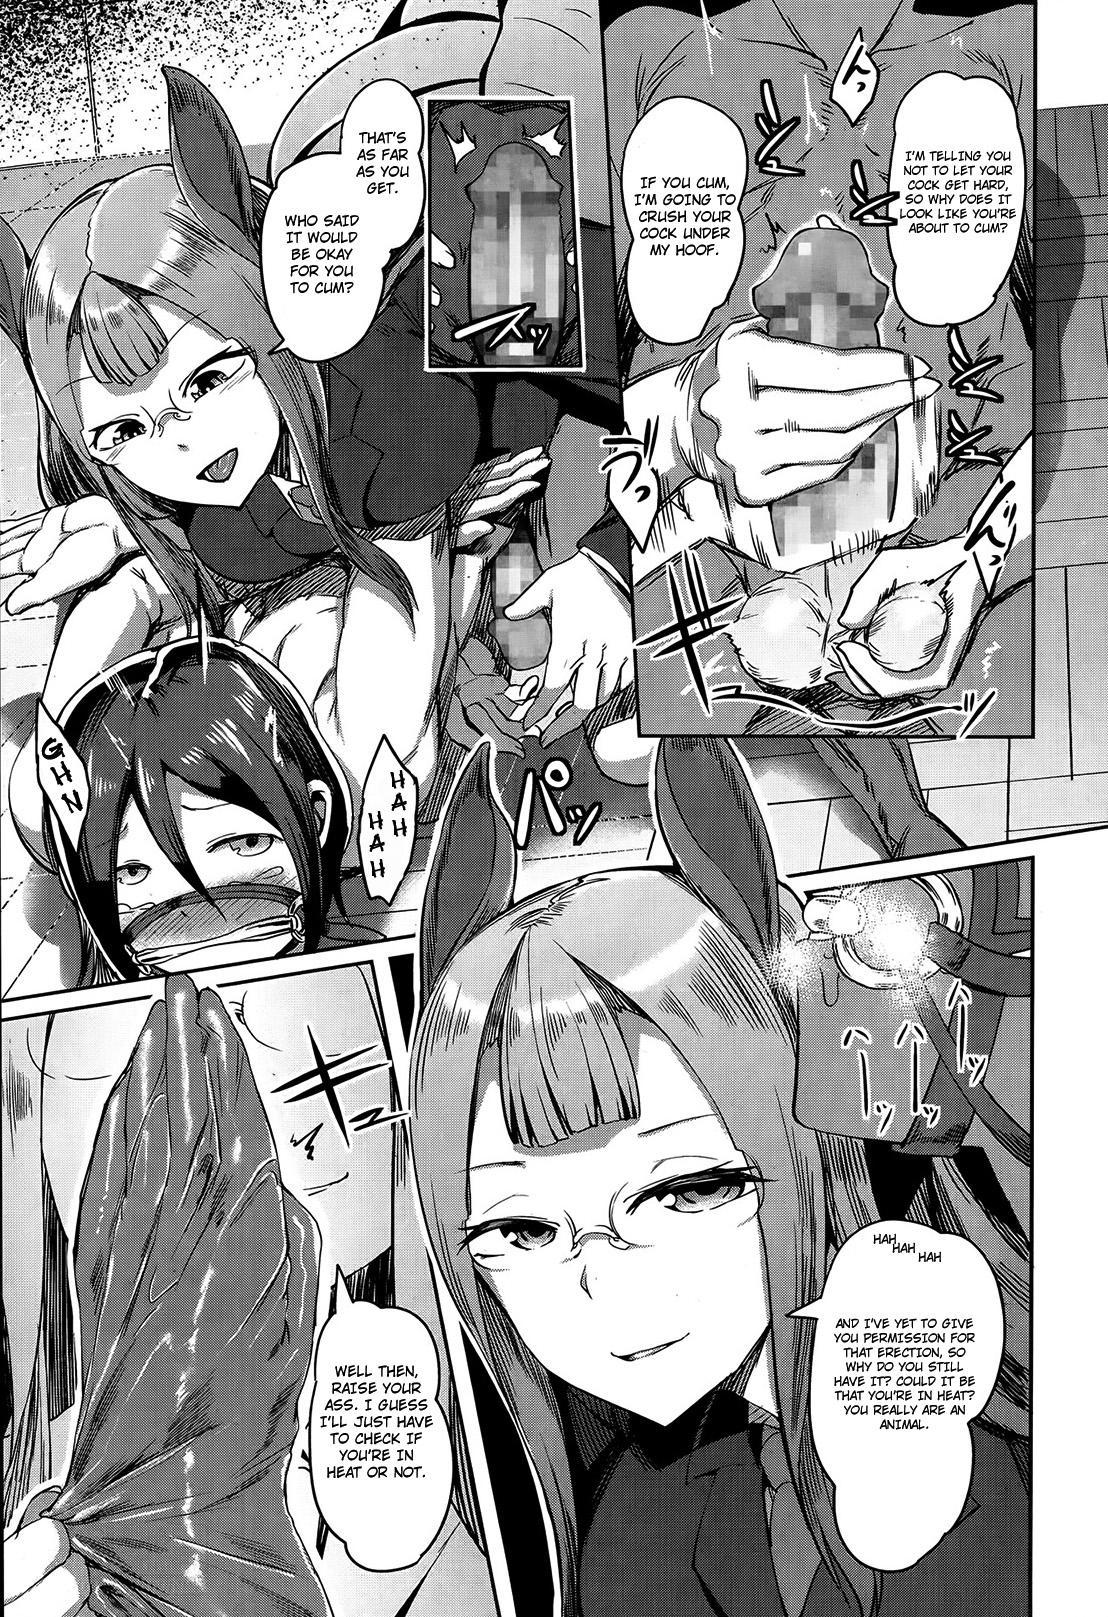 [AHOBAKA] Bokudakeno Mukougawa Ch. 0-1, 3-5, 7, 9 [English] [MintVoid + Vile + SaHa + thetsuuyaku] 72